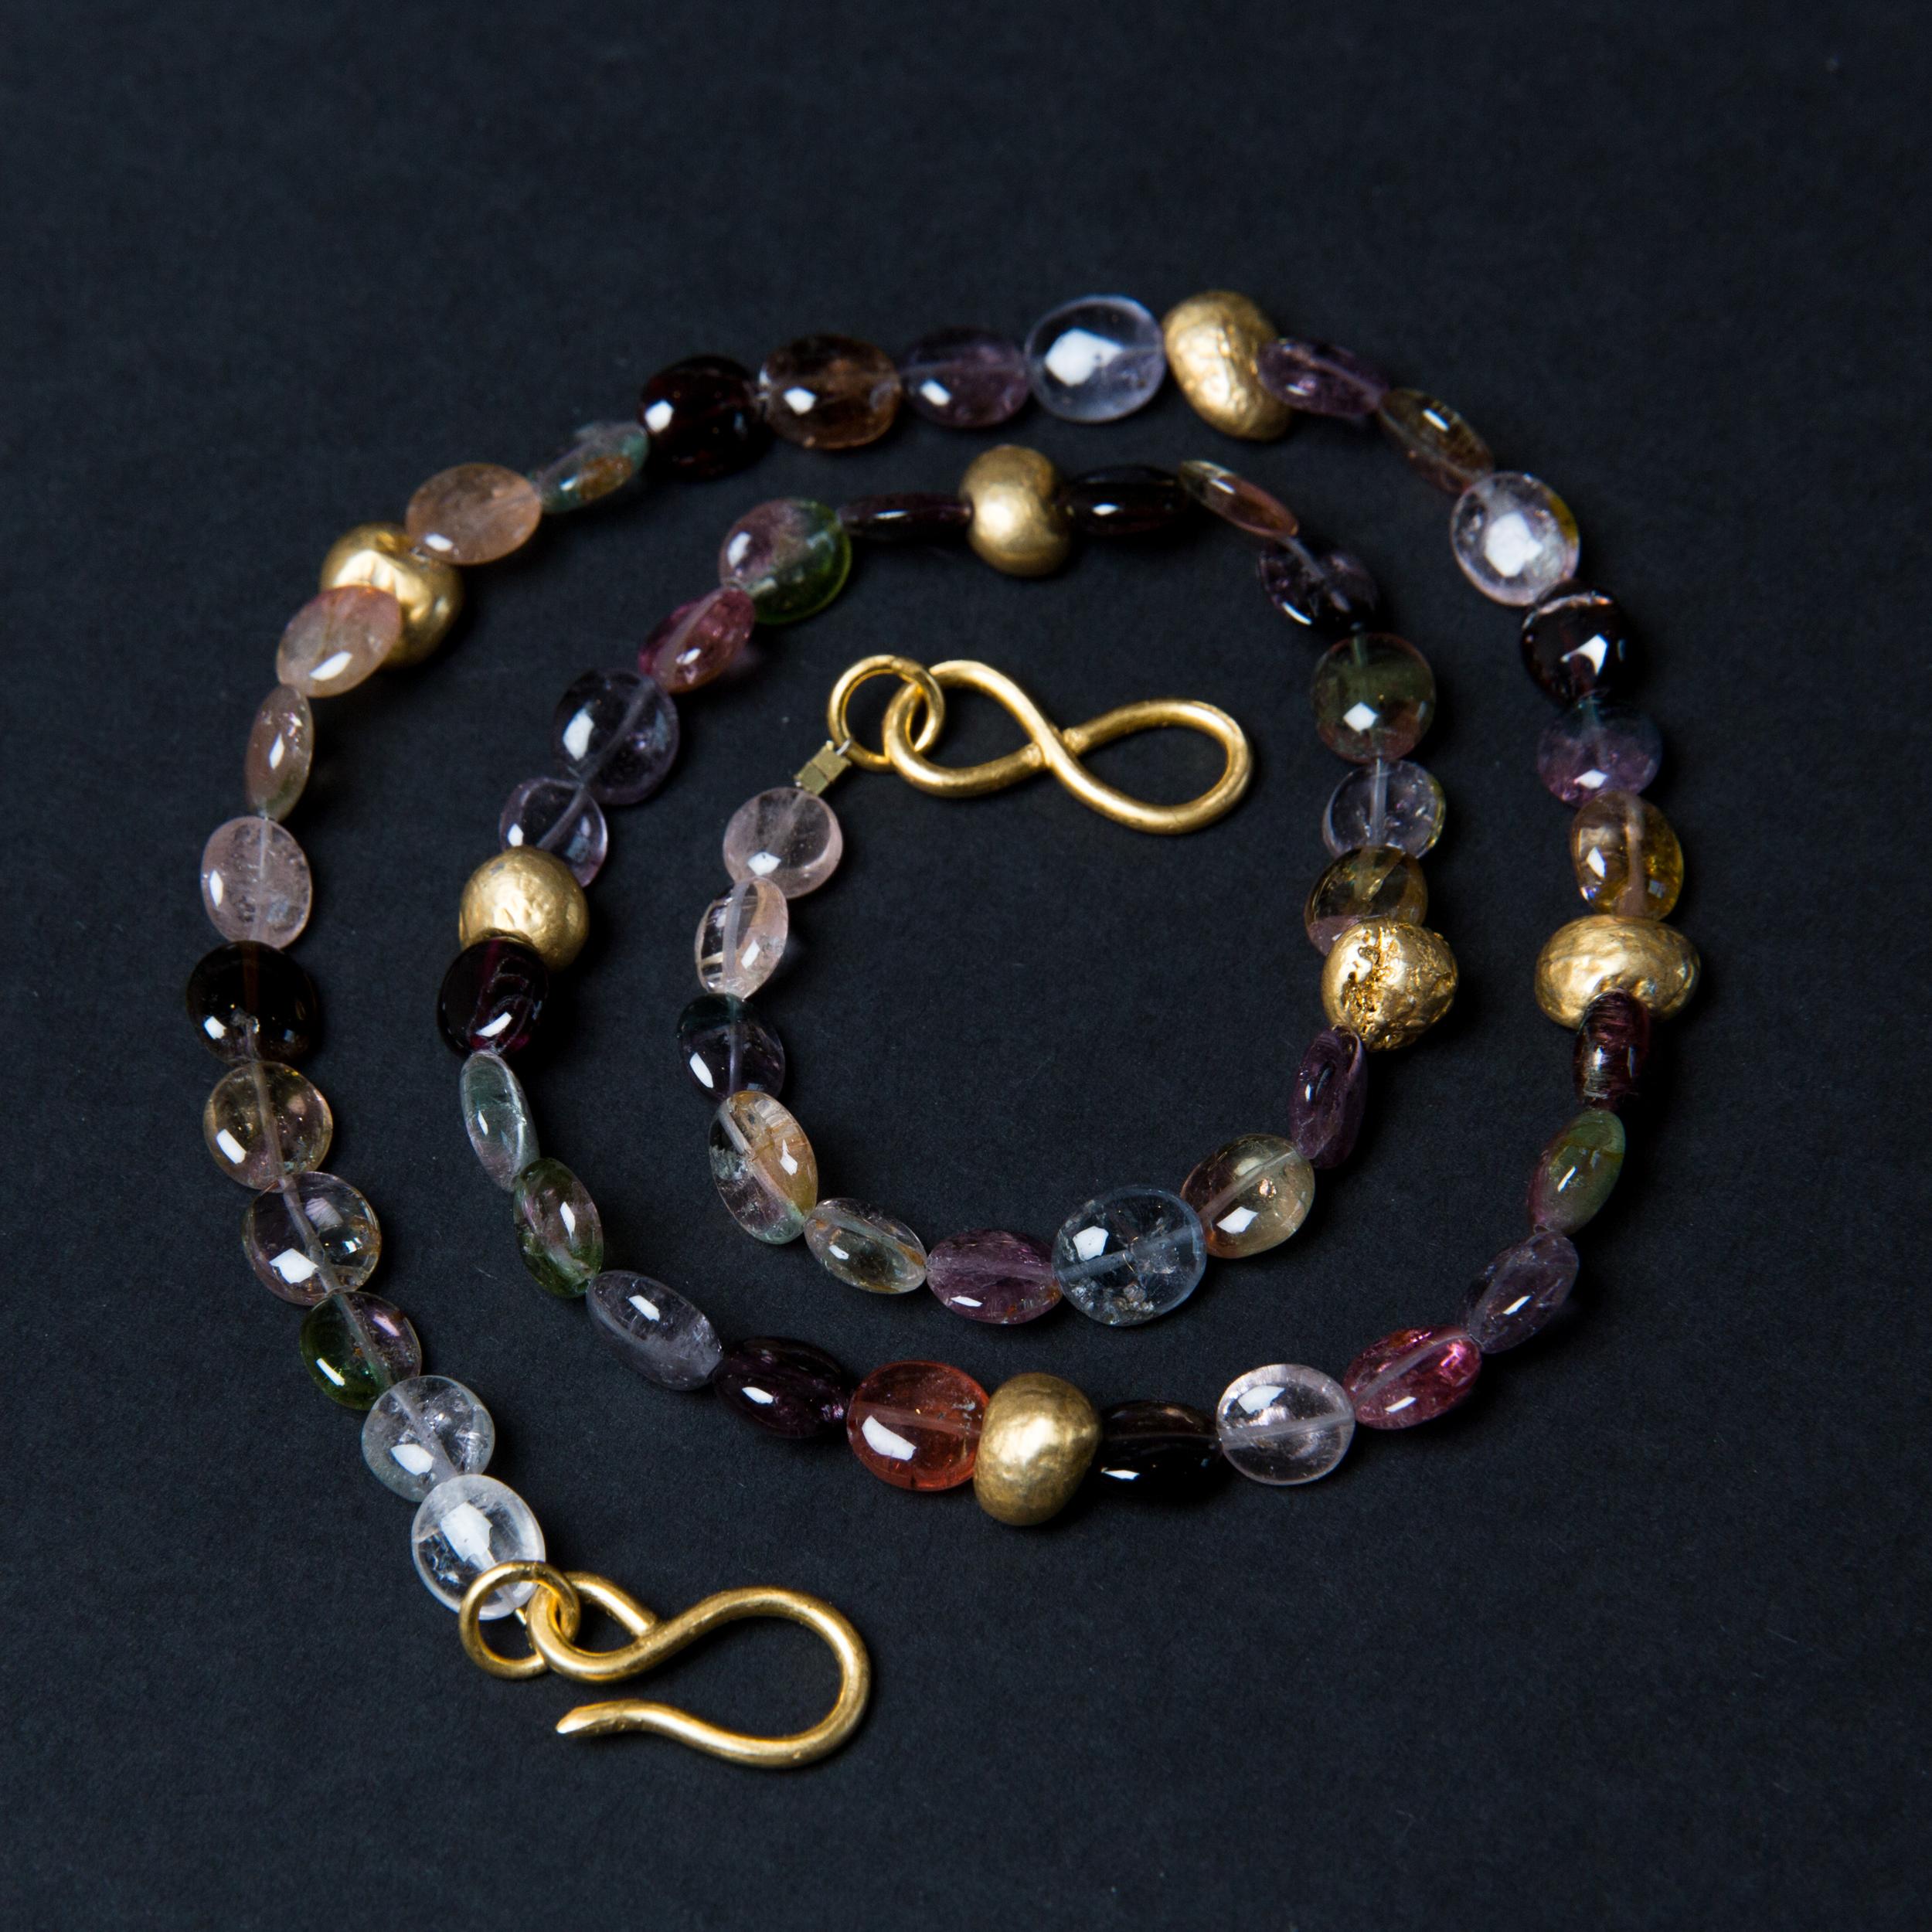 Mum Jewellery August 2013-9.jpg